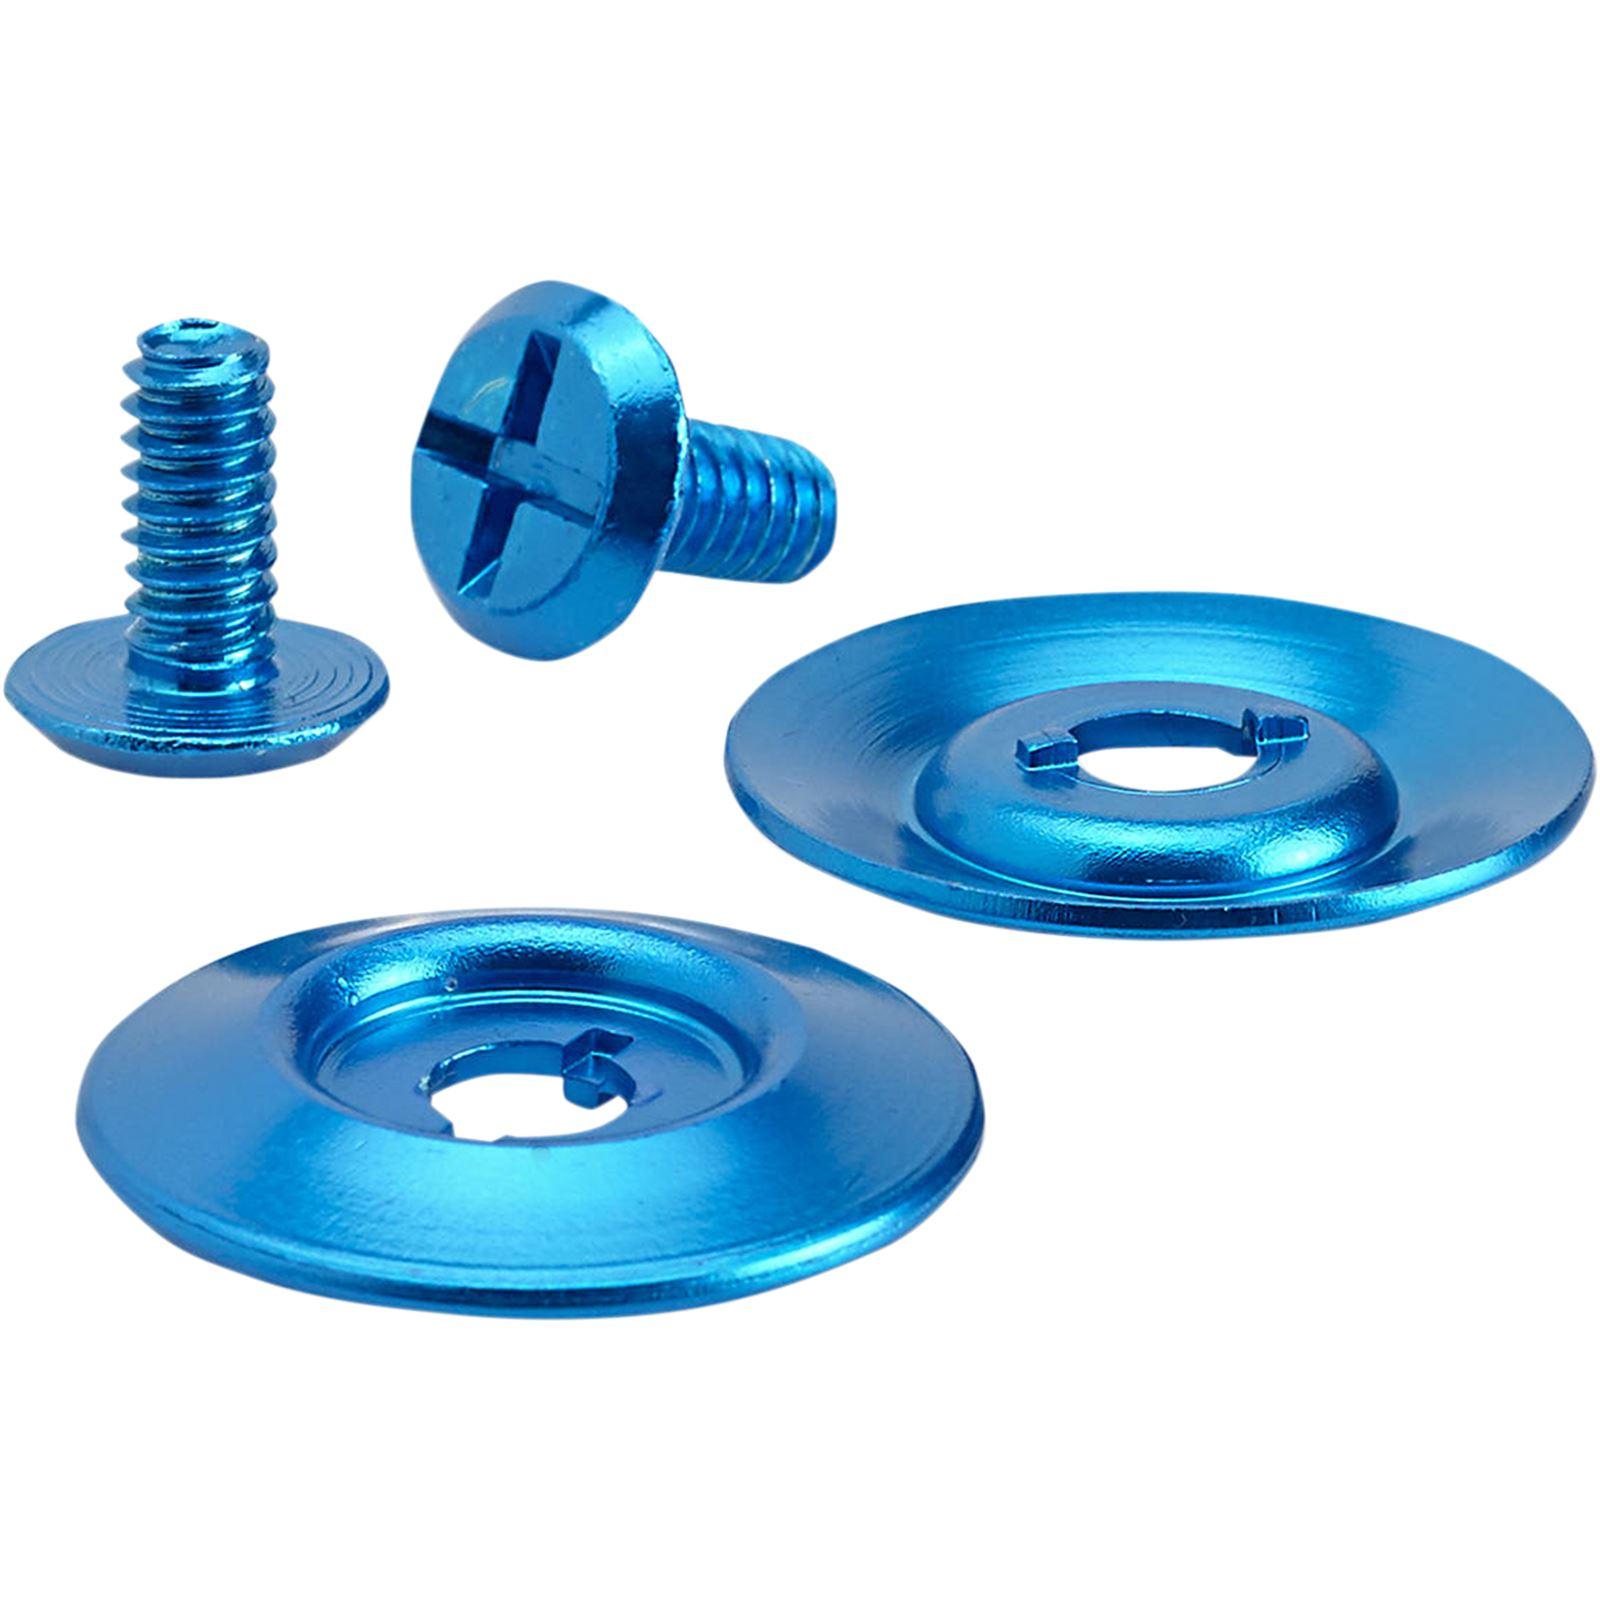 Biltwell Inc. Gringo S Hardware Kit - Blue